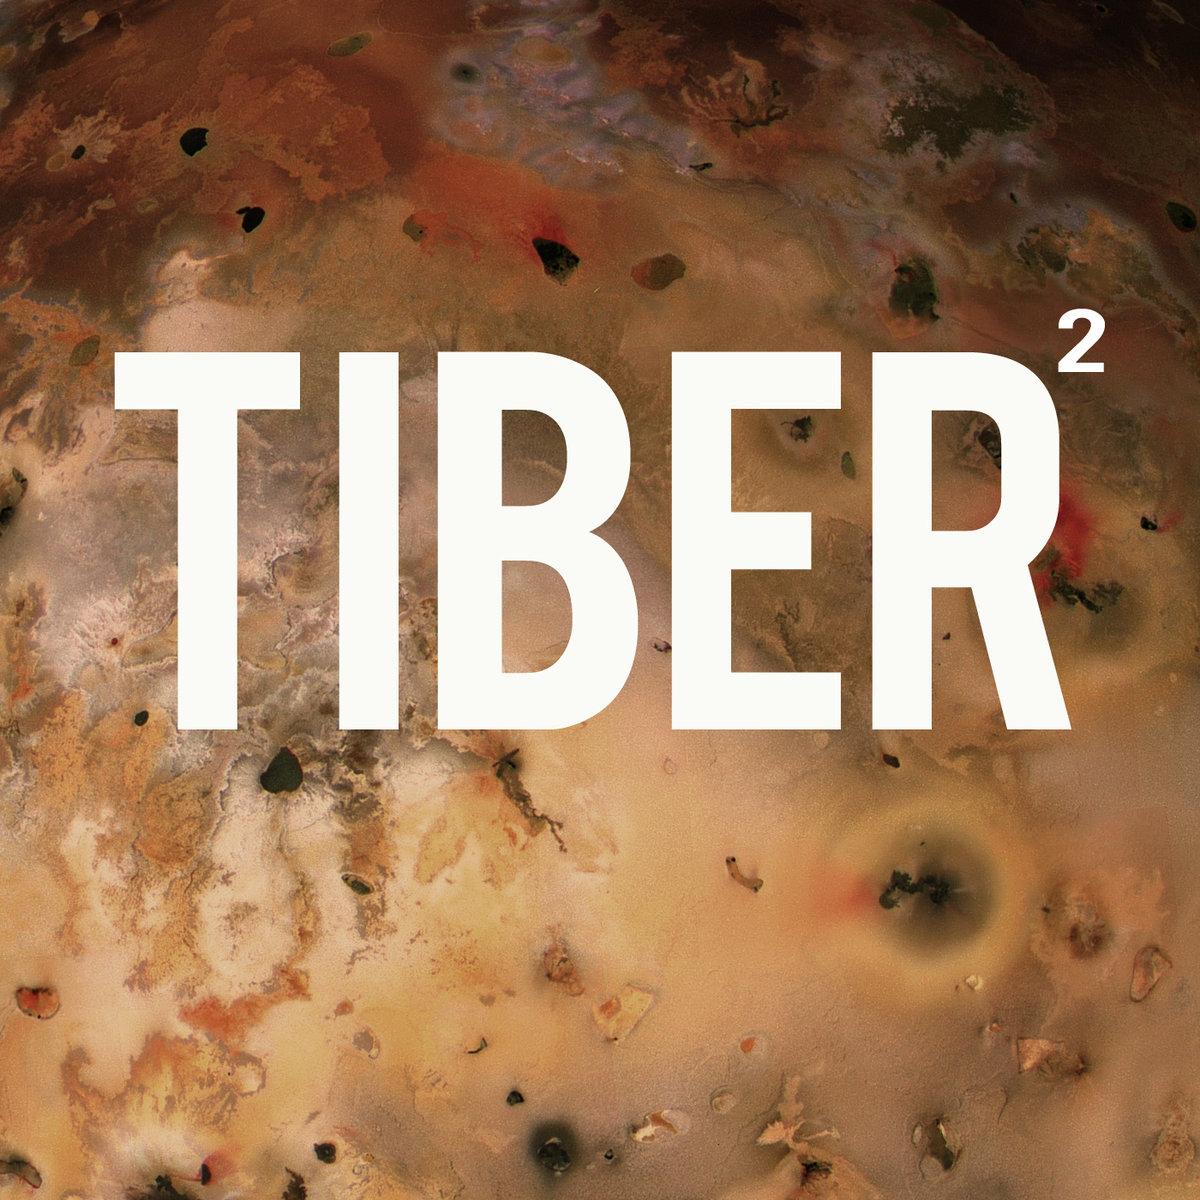 Tiber - Tiber 2 - Released March 2013